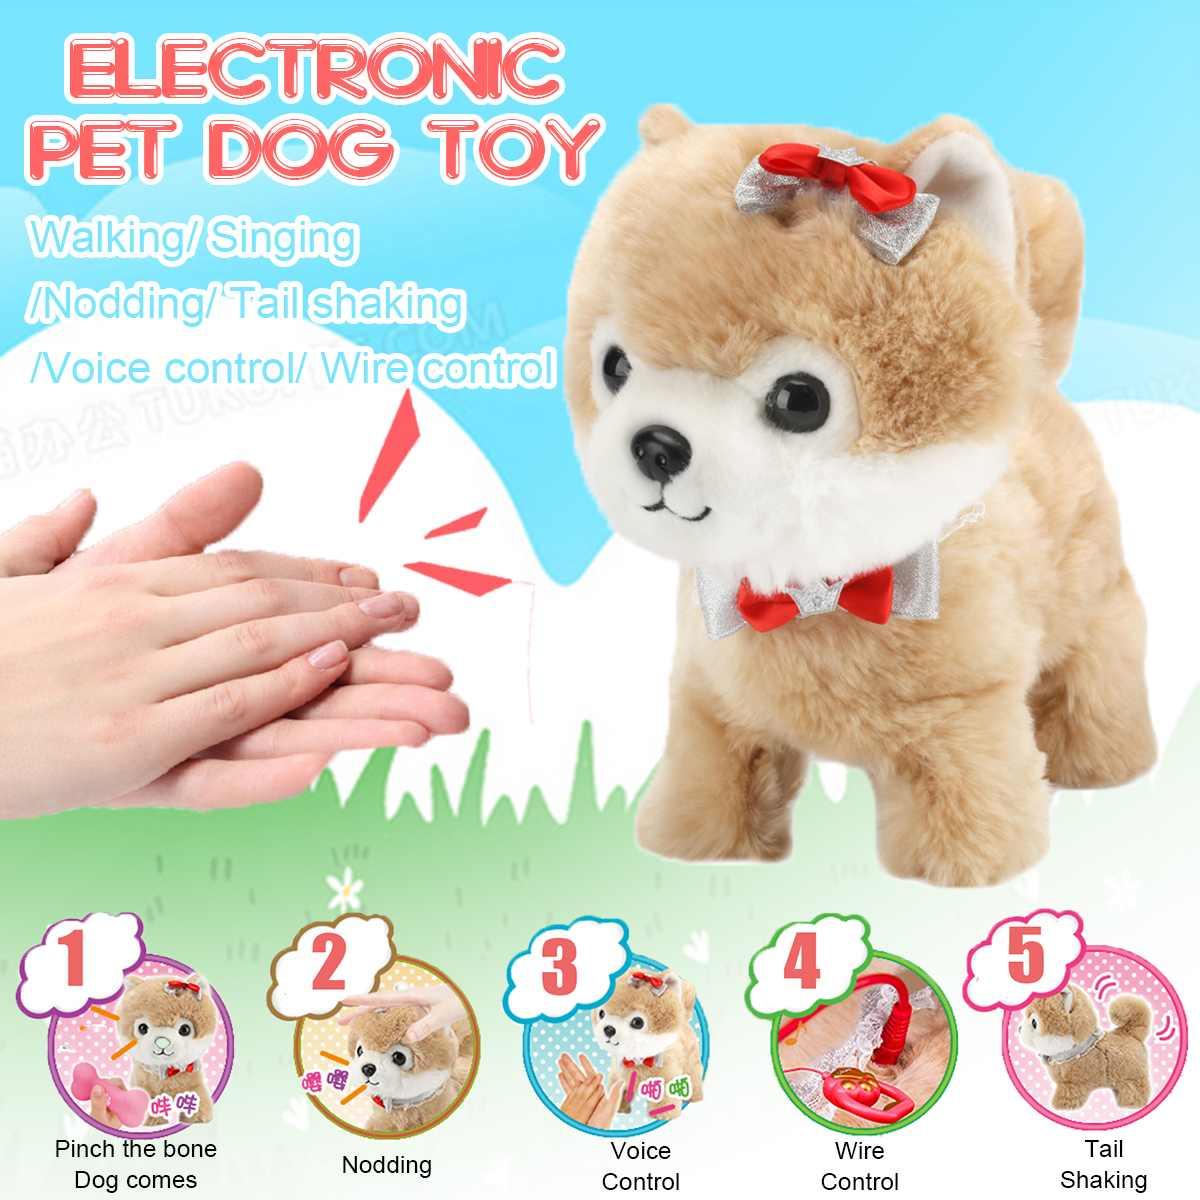 Robot Dog Sound Control Interactive Dog Electronic Toy Plush Puppy Pet Walk Bark Leash Teddy Toy For Kids Children Birthday Gift